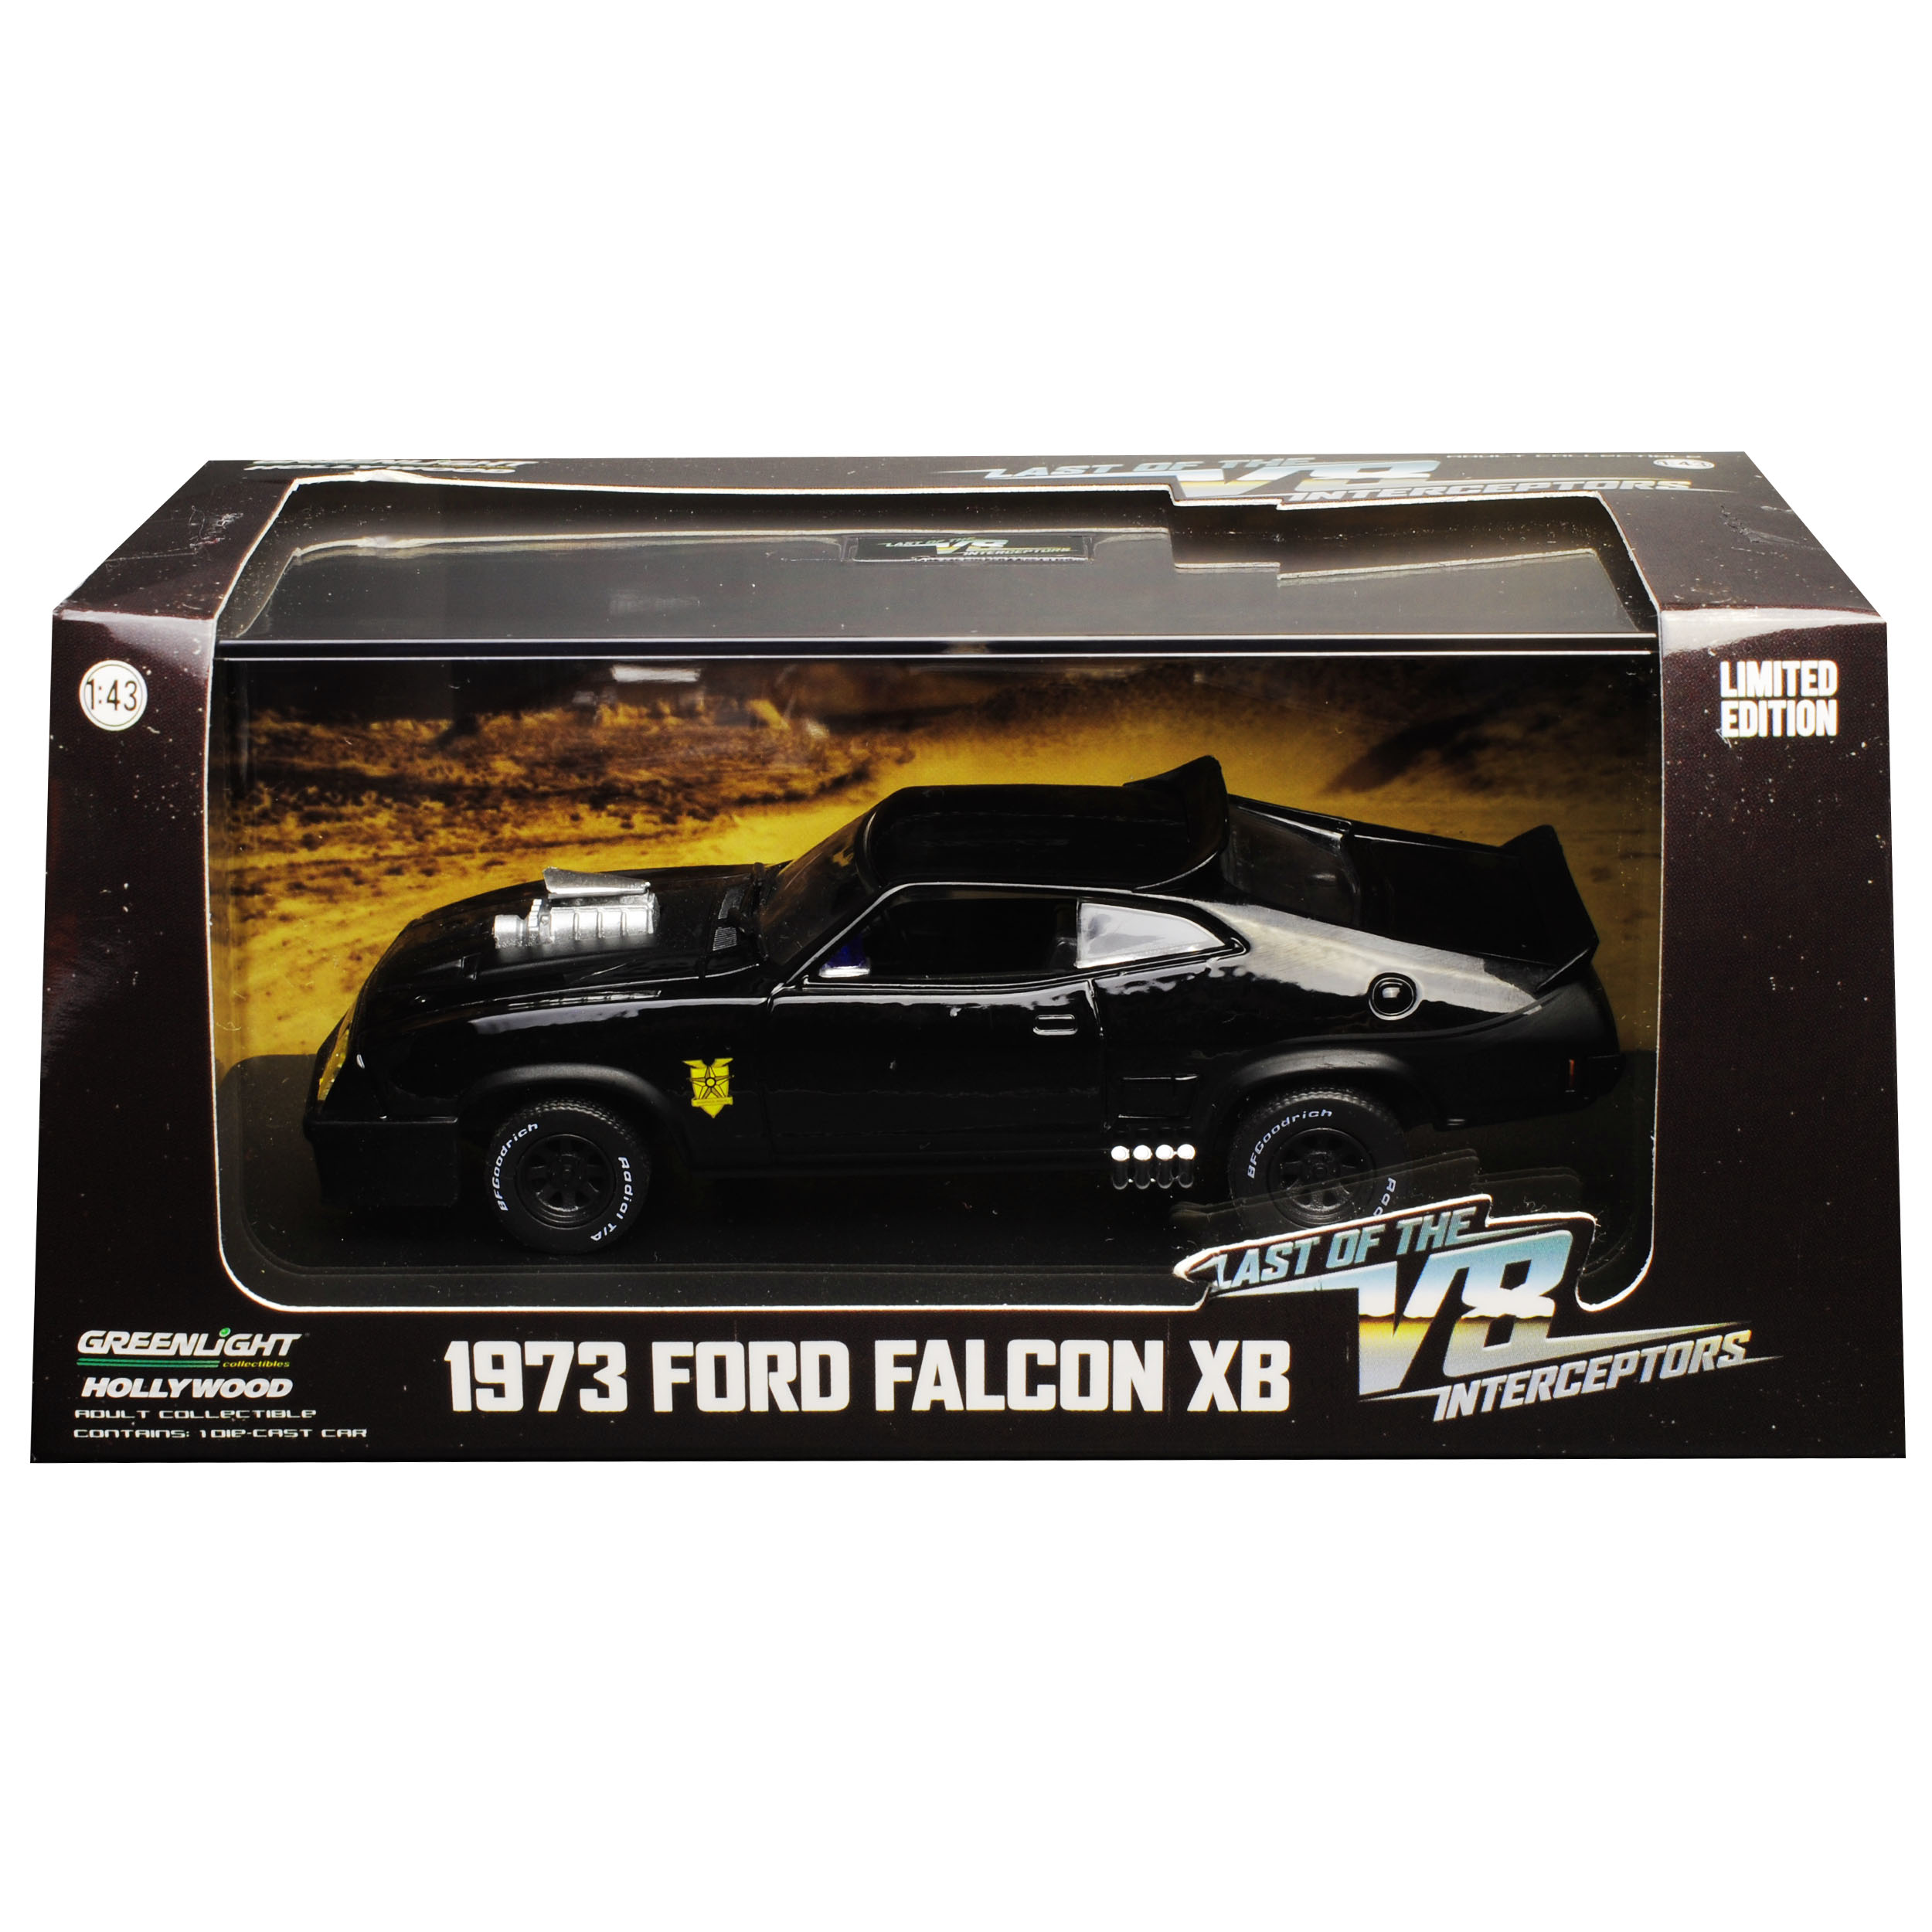 Ford-xb-Falcon-tuned-version-Mad-Max-II-2-Black-interceptor-negro-1973-1-43 miniatura 10